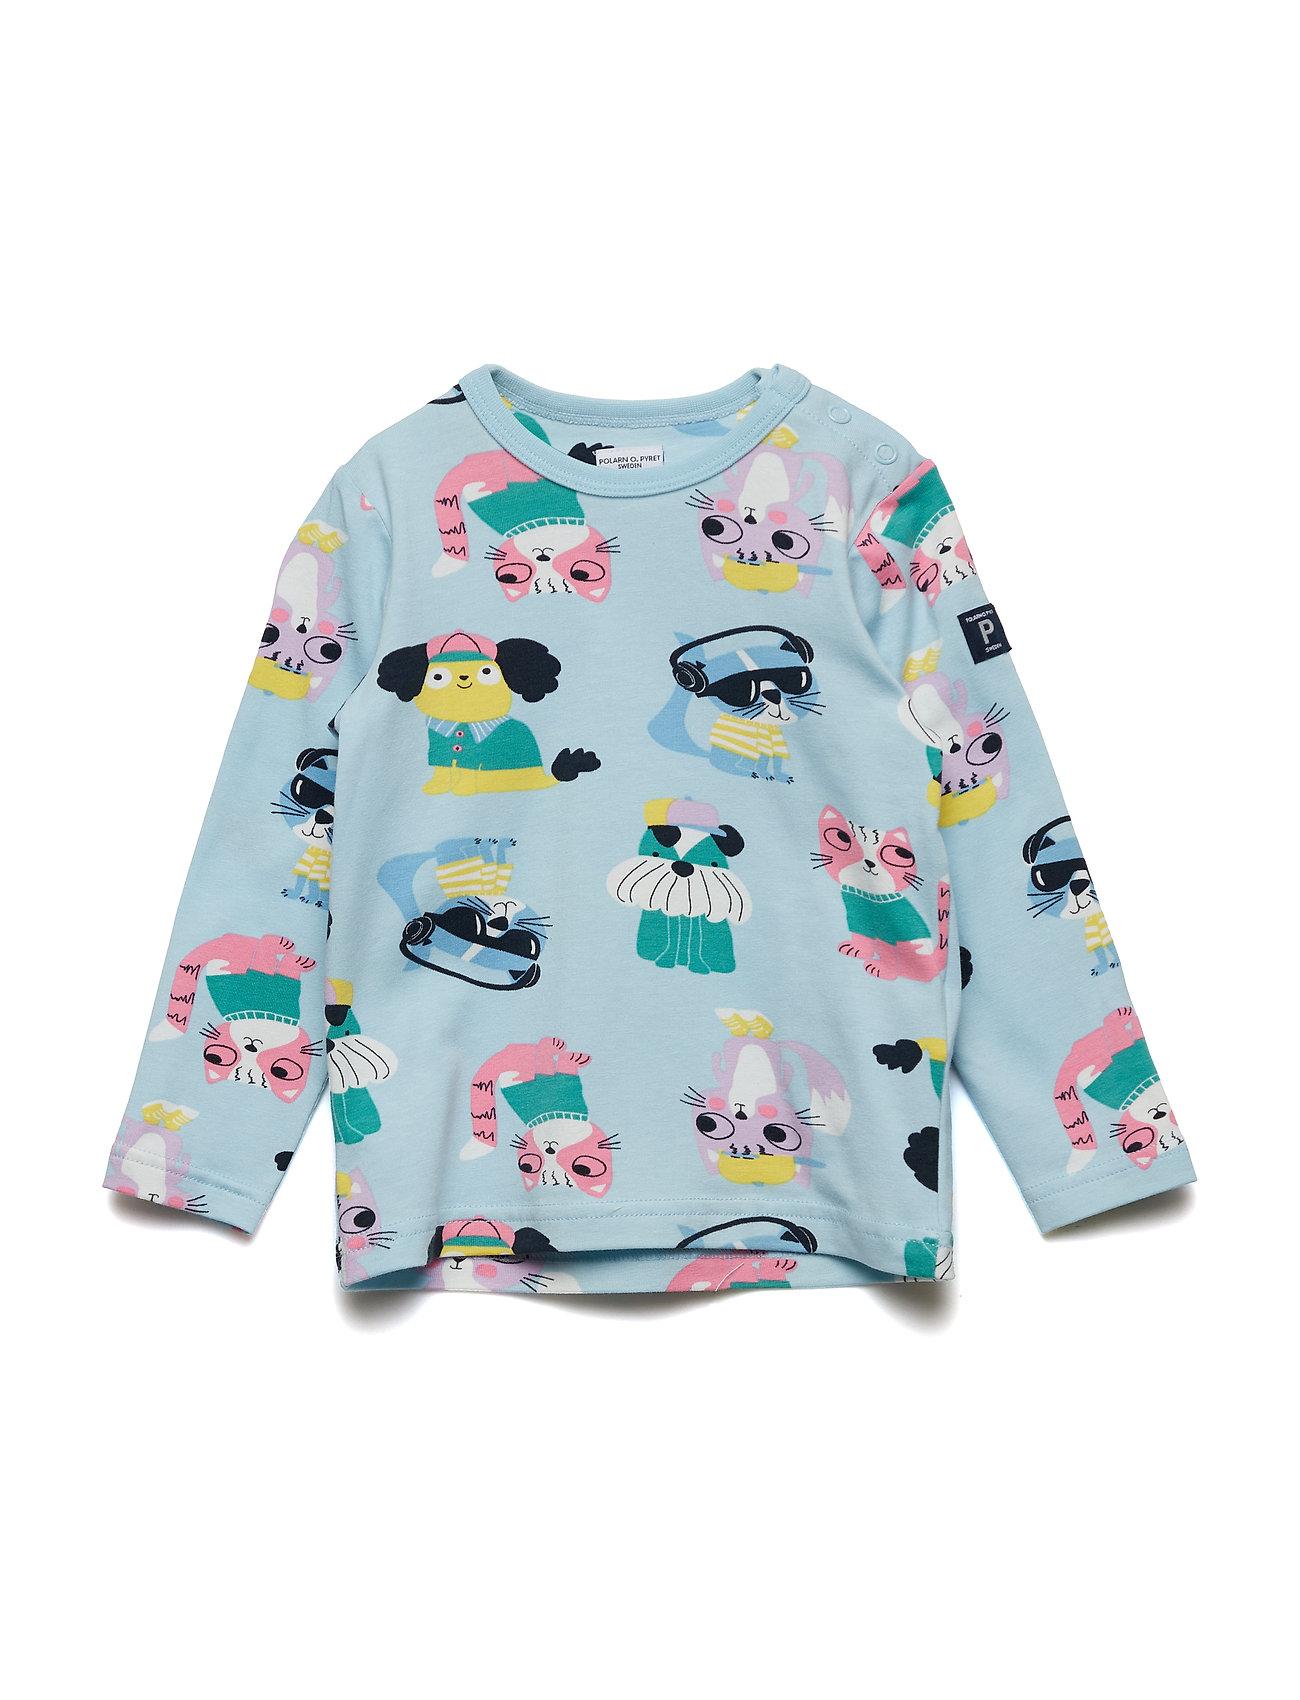 Polarn O. Pyret T-shirt l/s AOP Preschool